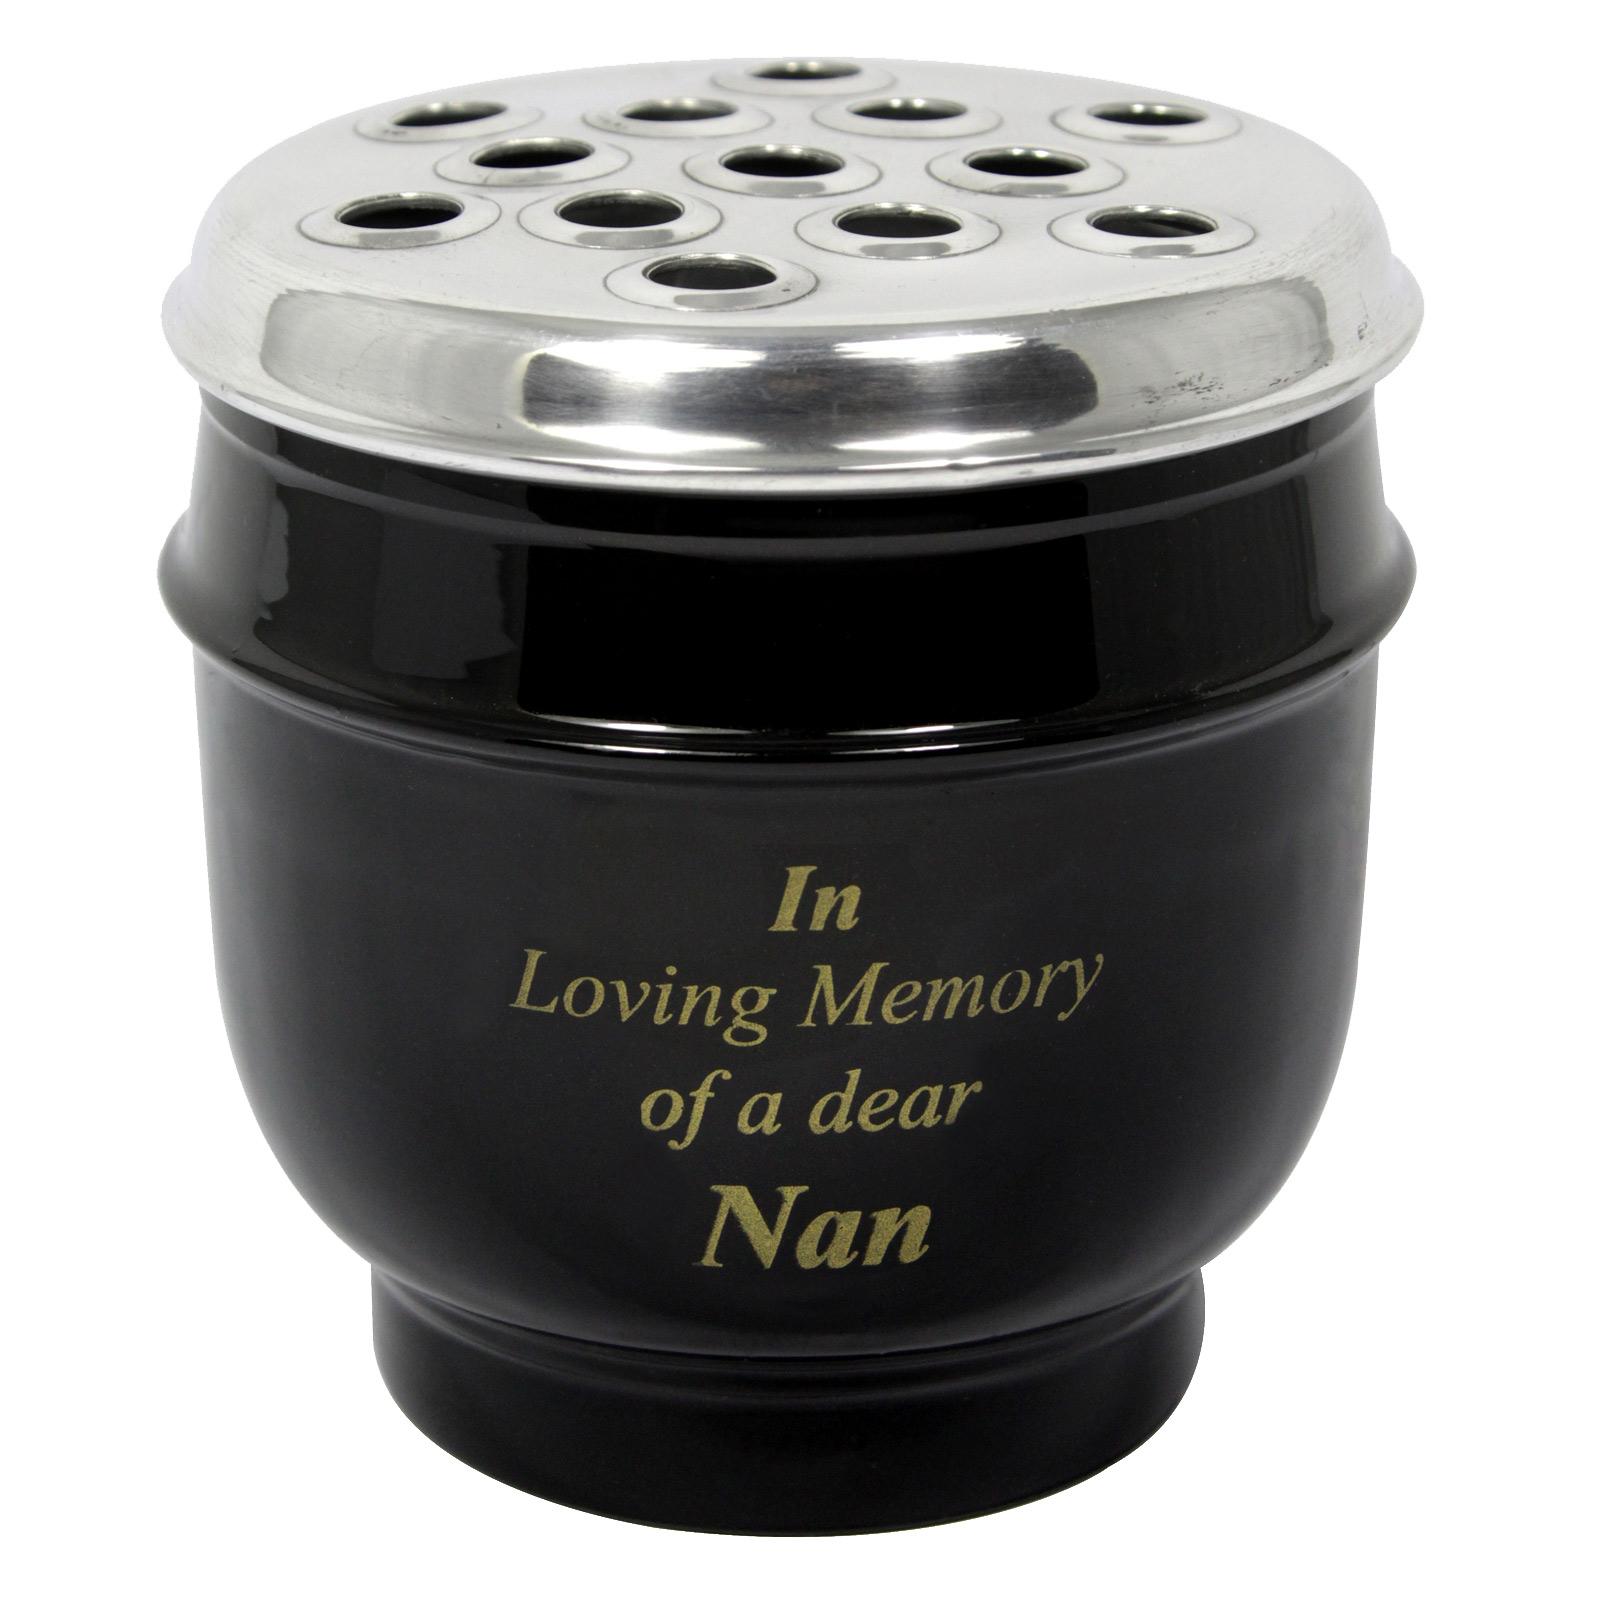 METAL GRAVE VASE BLACK WITH SILVER LID IN LOVING MEMORY OF A DEAR NAN 14CM